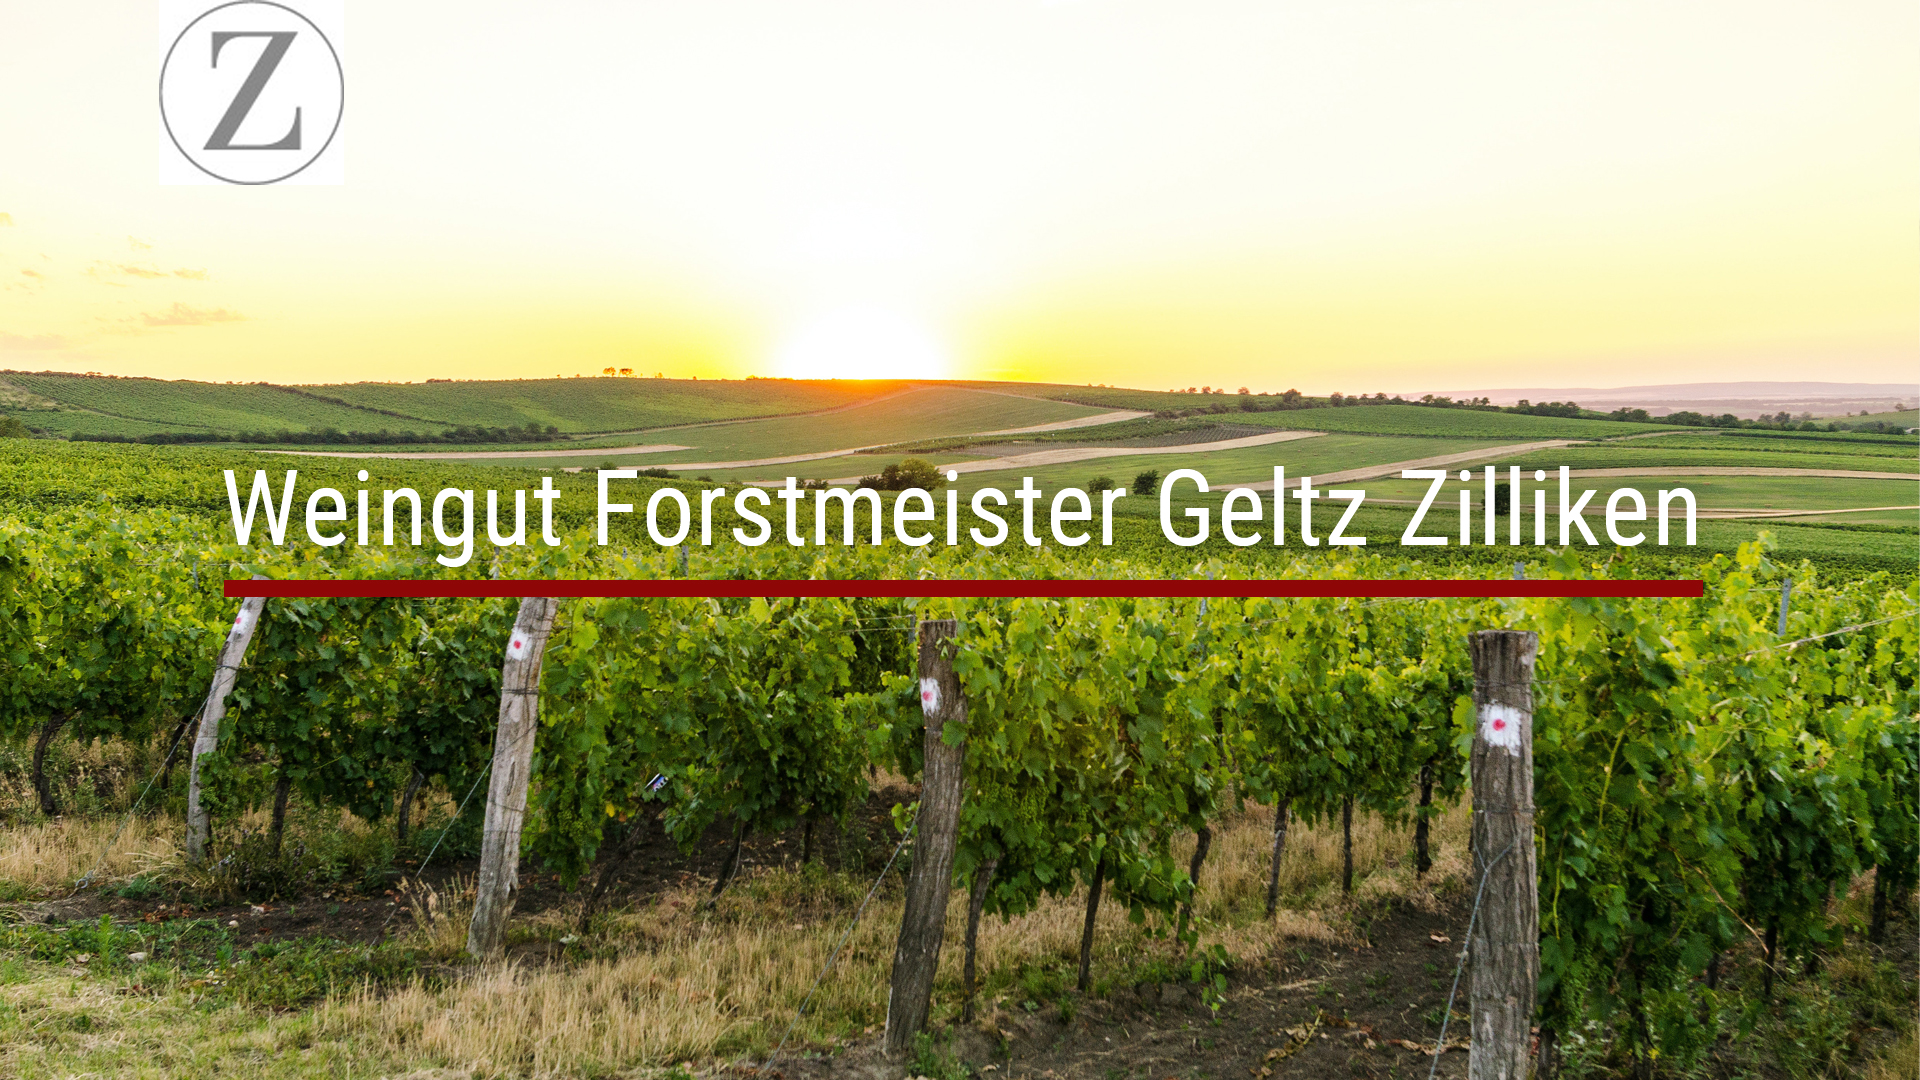 Dorothee Zilliken – Winery Forstmeister Geltz Zilliken